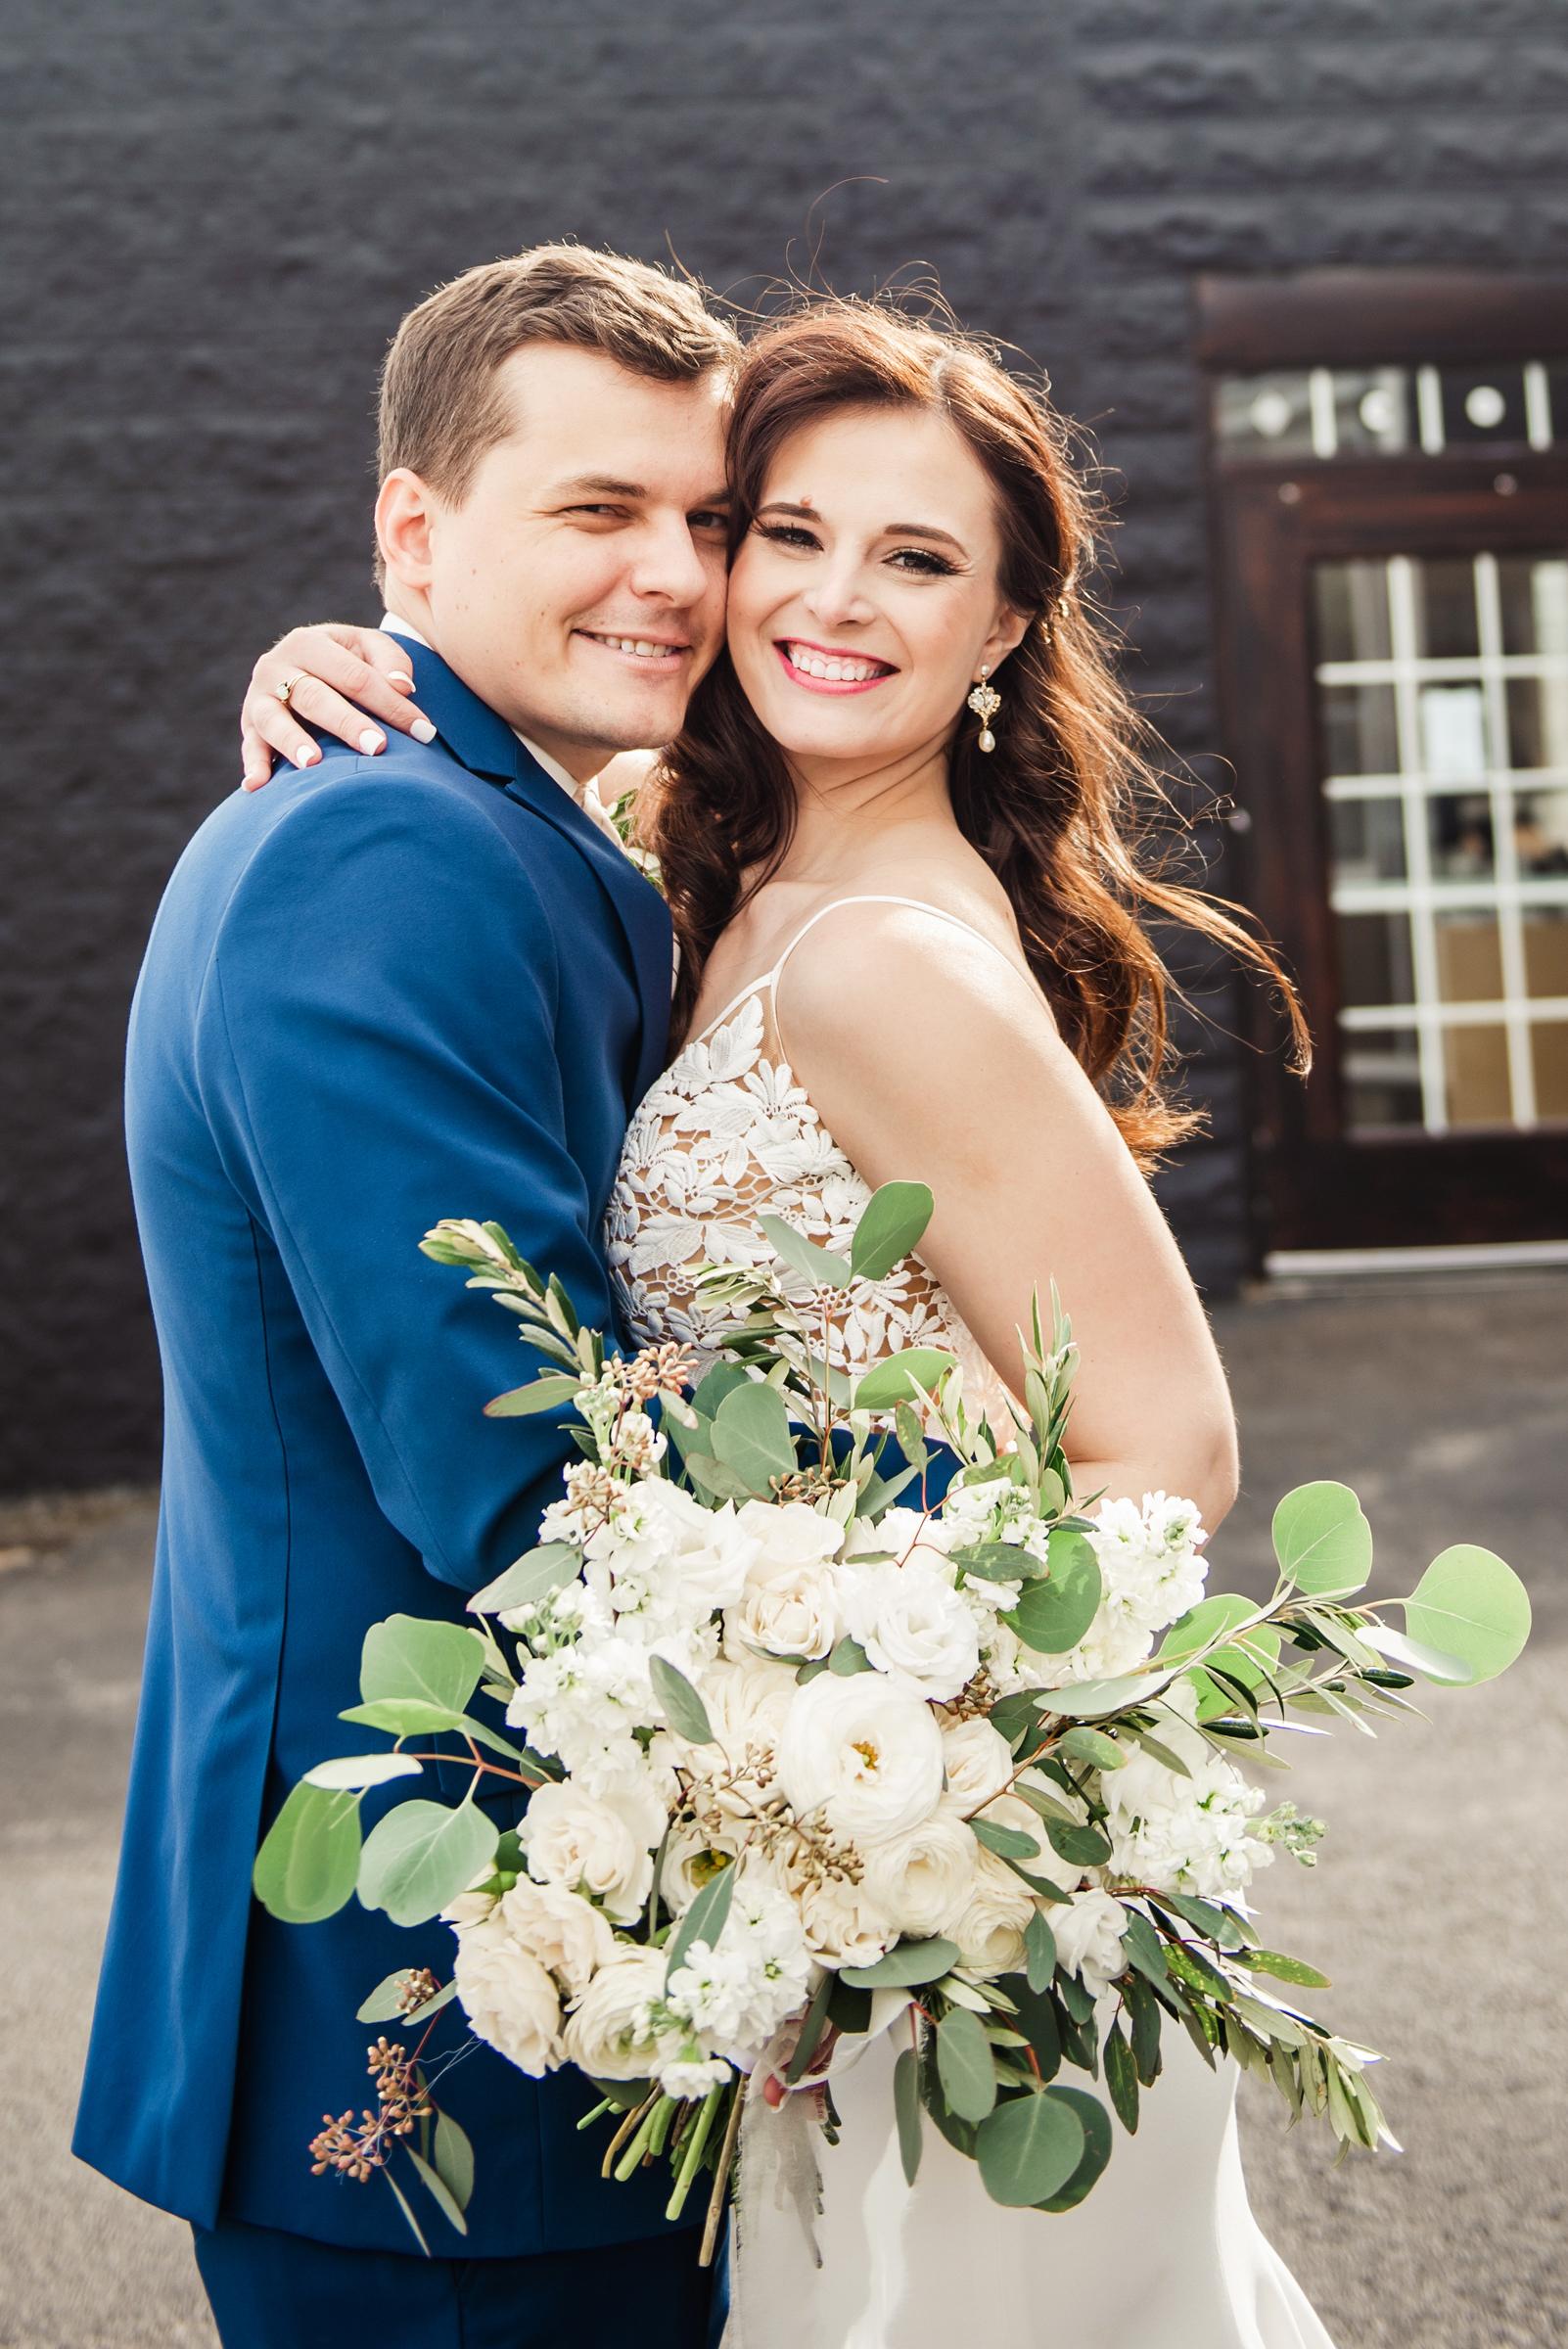 The_Arbor_LoftRochester_Wedding_JILL_STUDIO_Rochester_NY_Photographer_160548.jpg